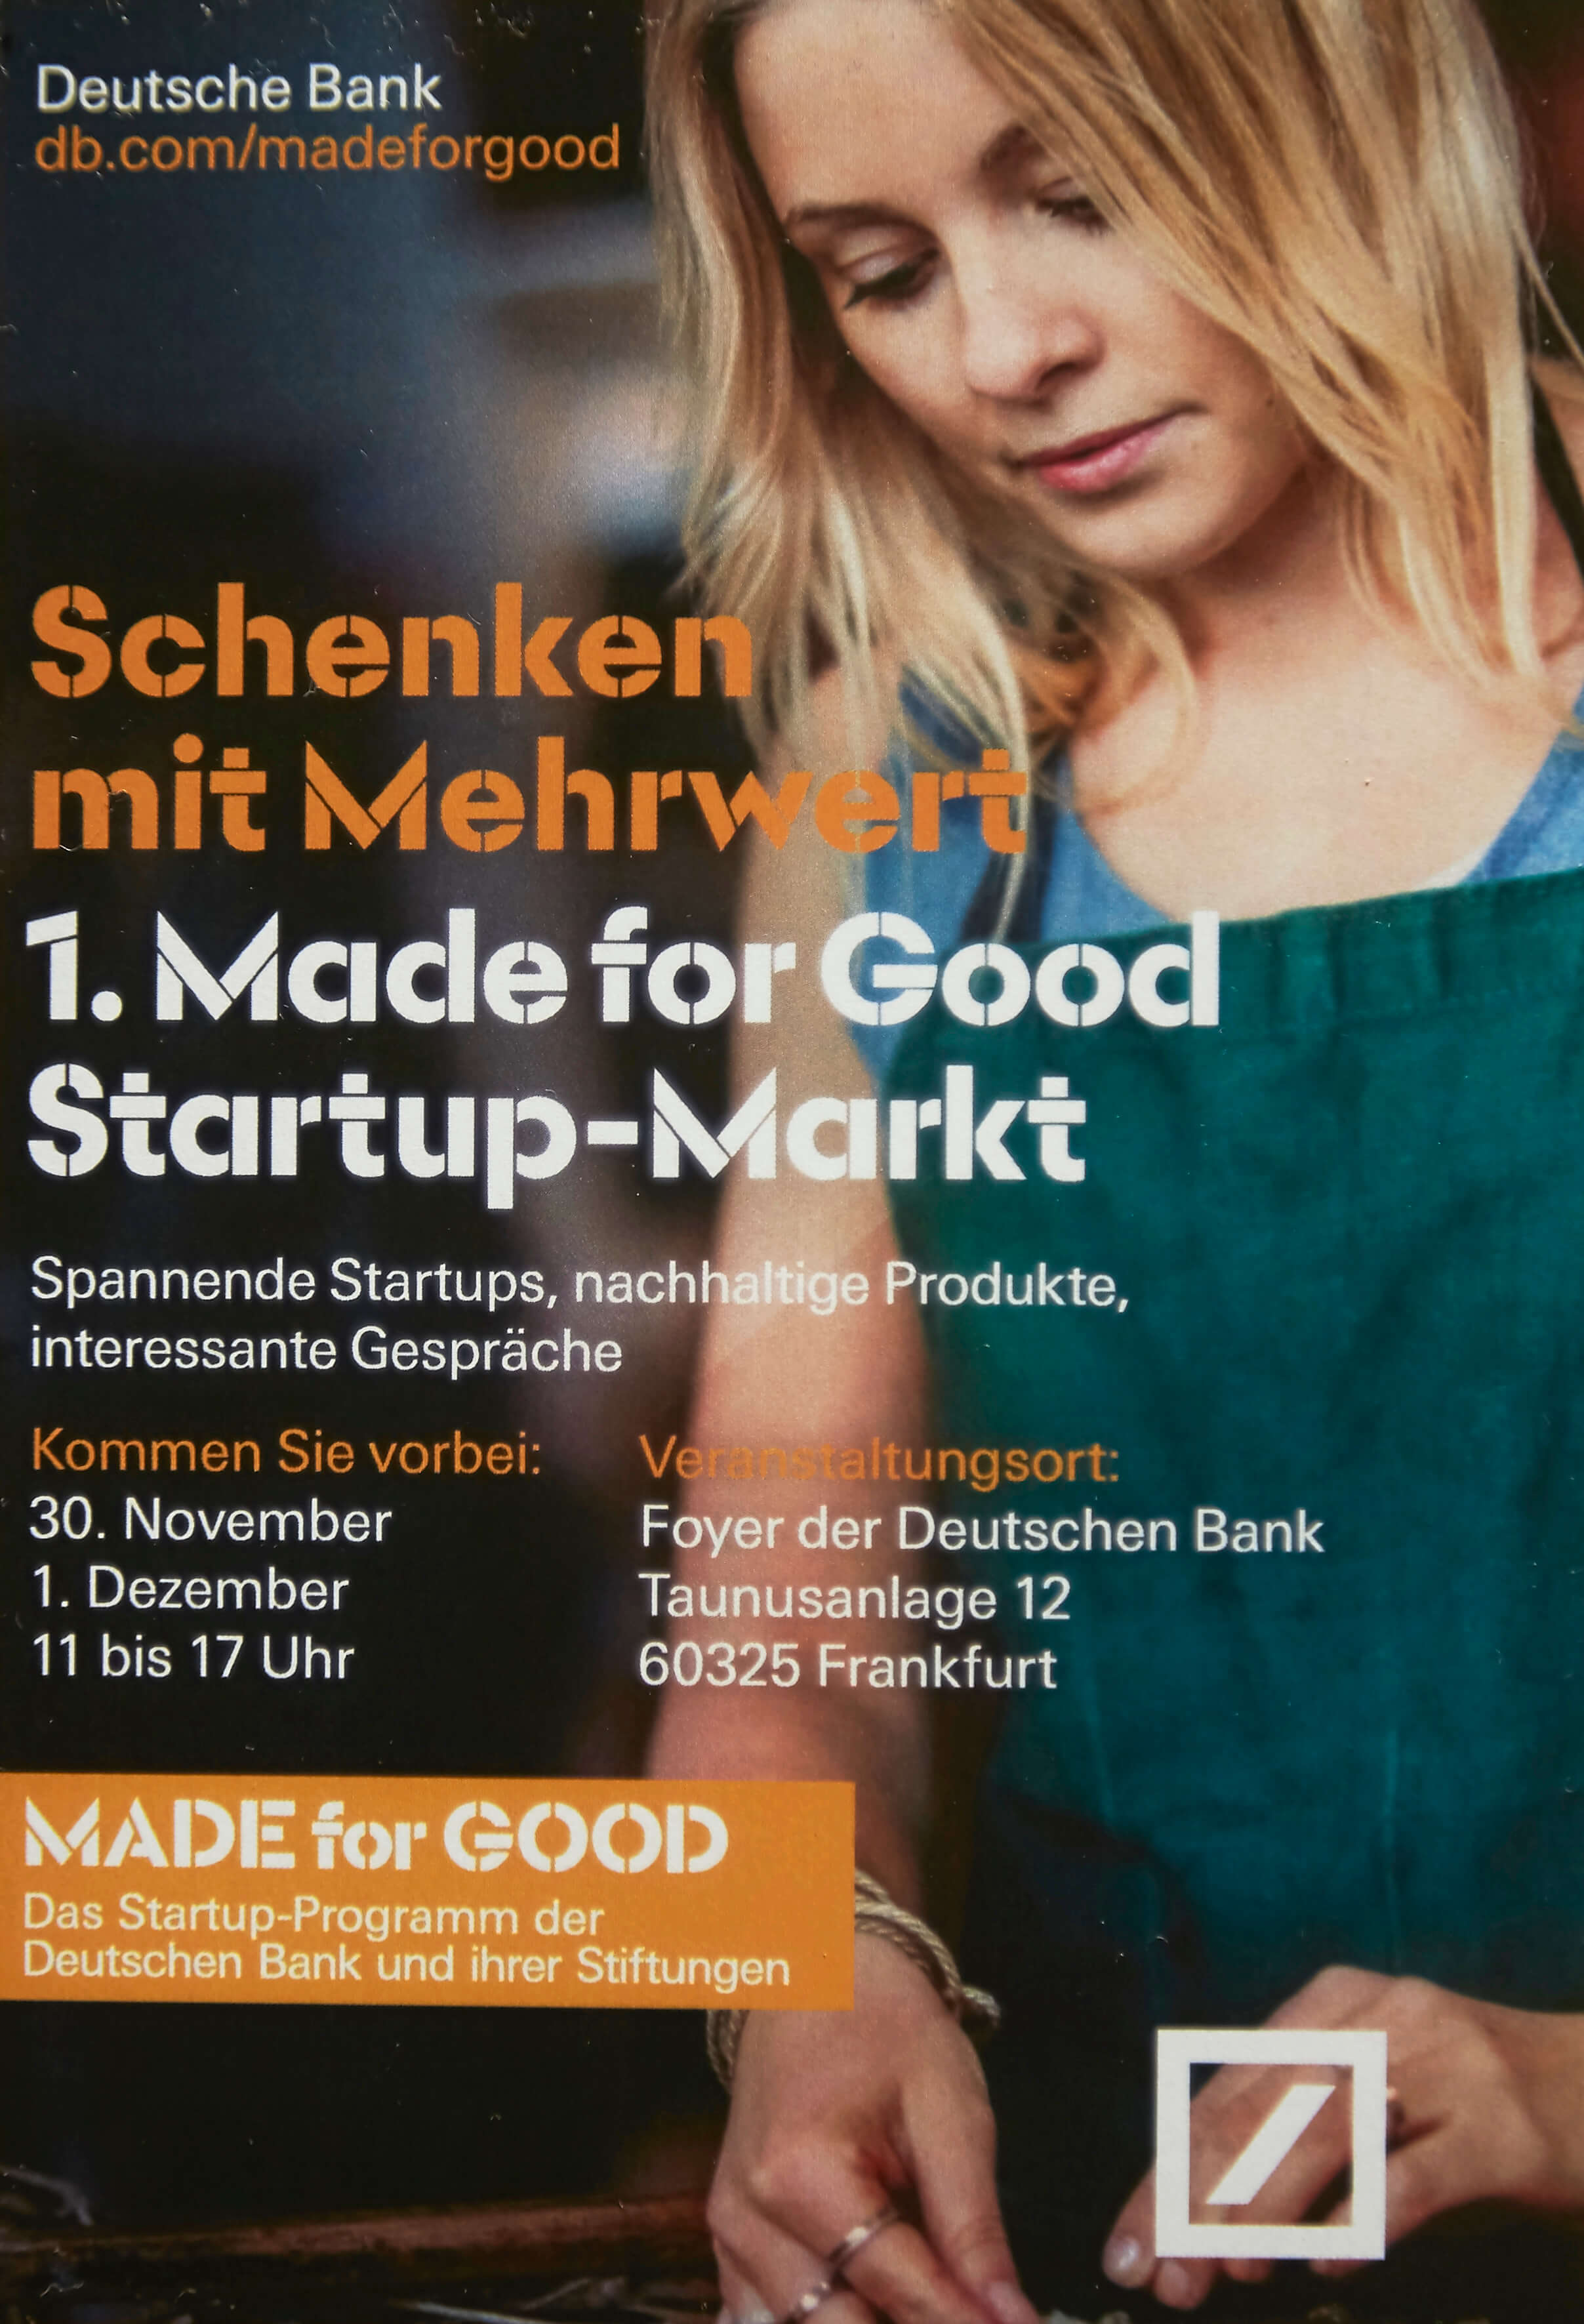 Deutsche Bank Made for Good Dezember 2016